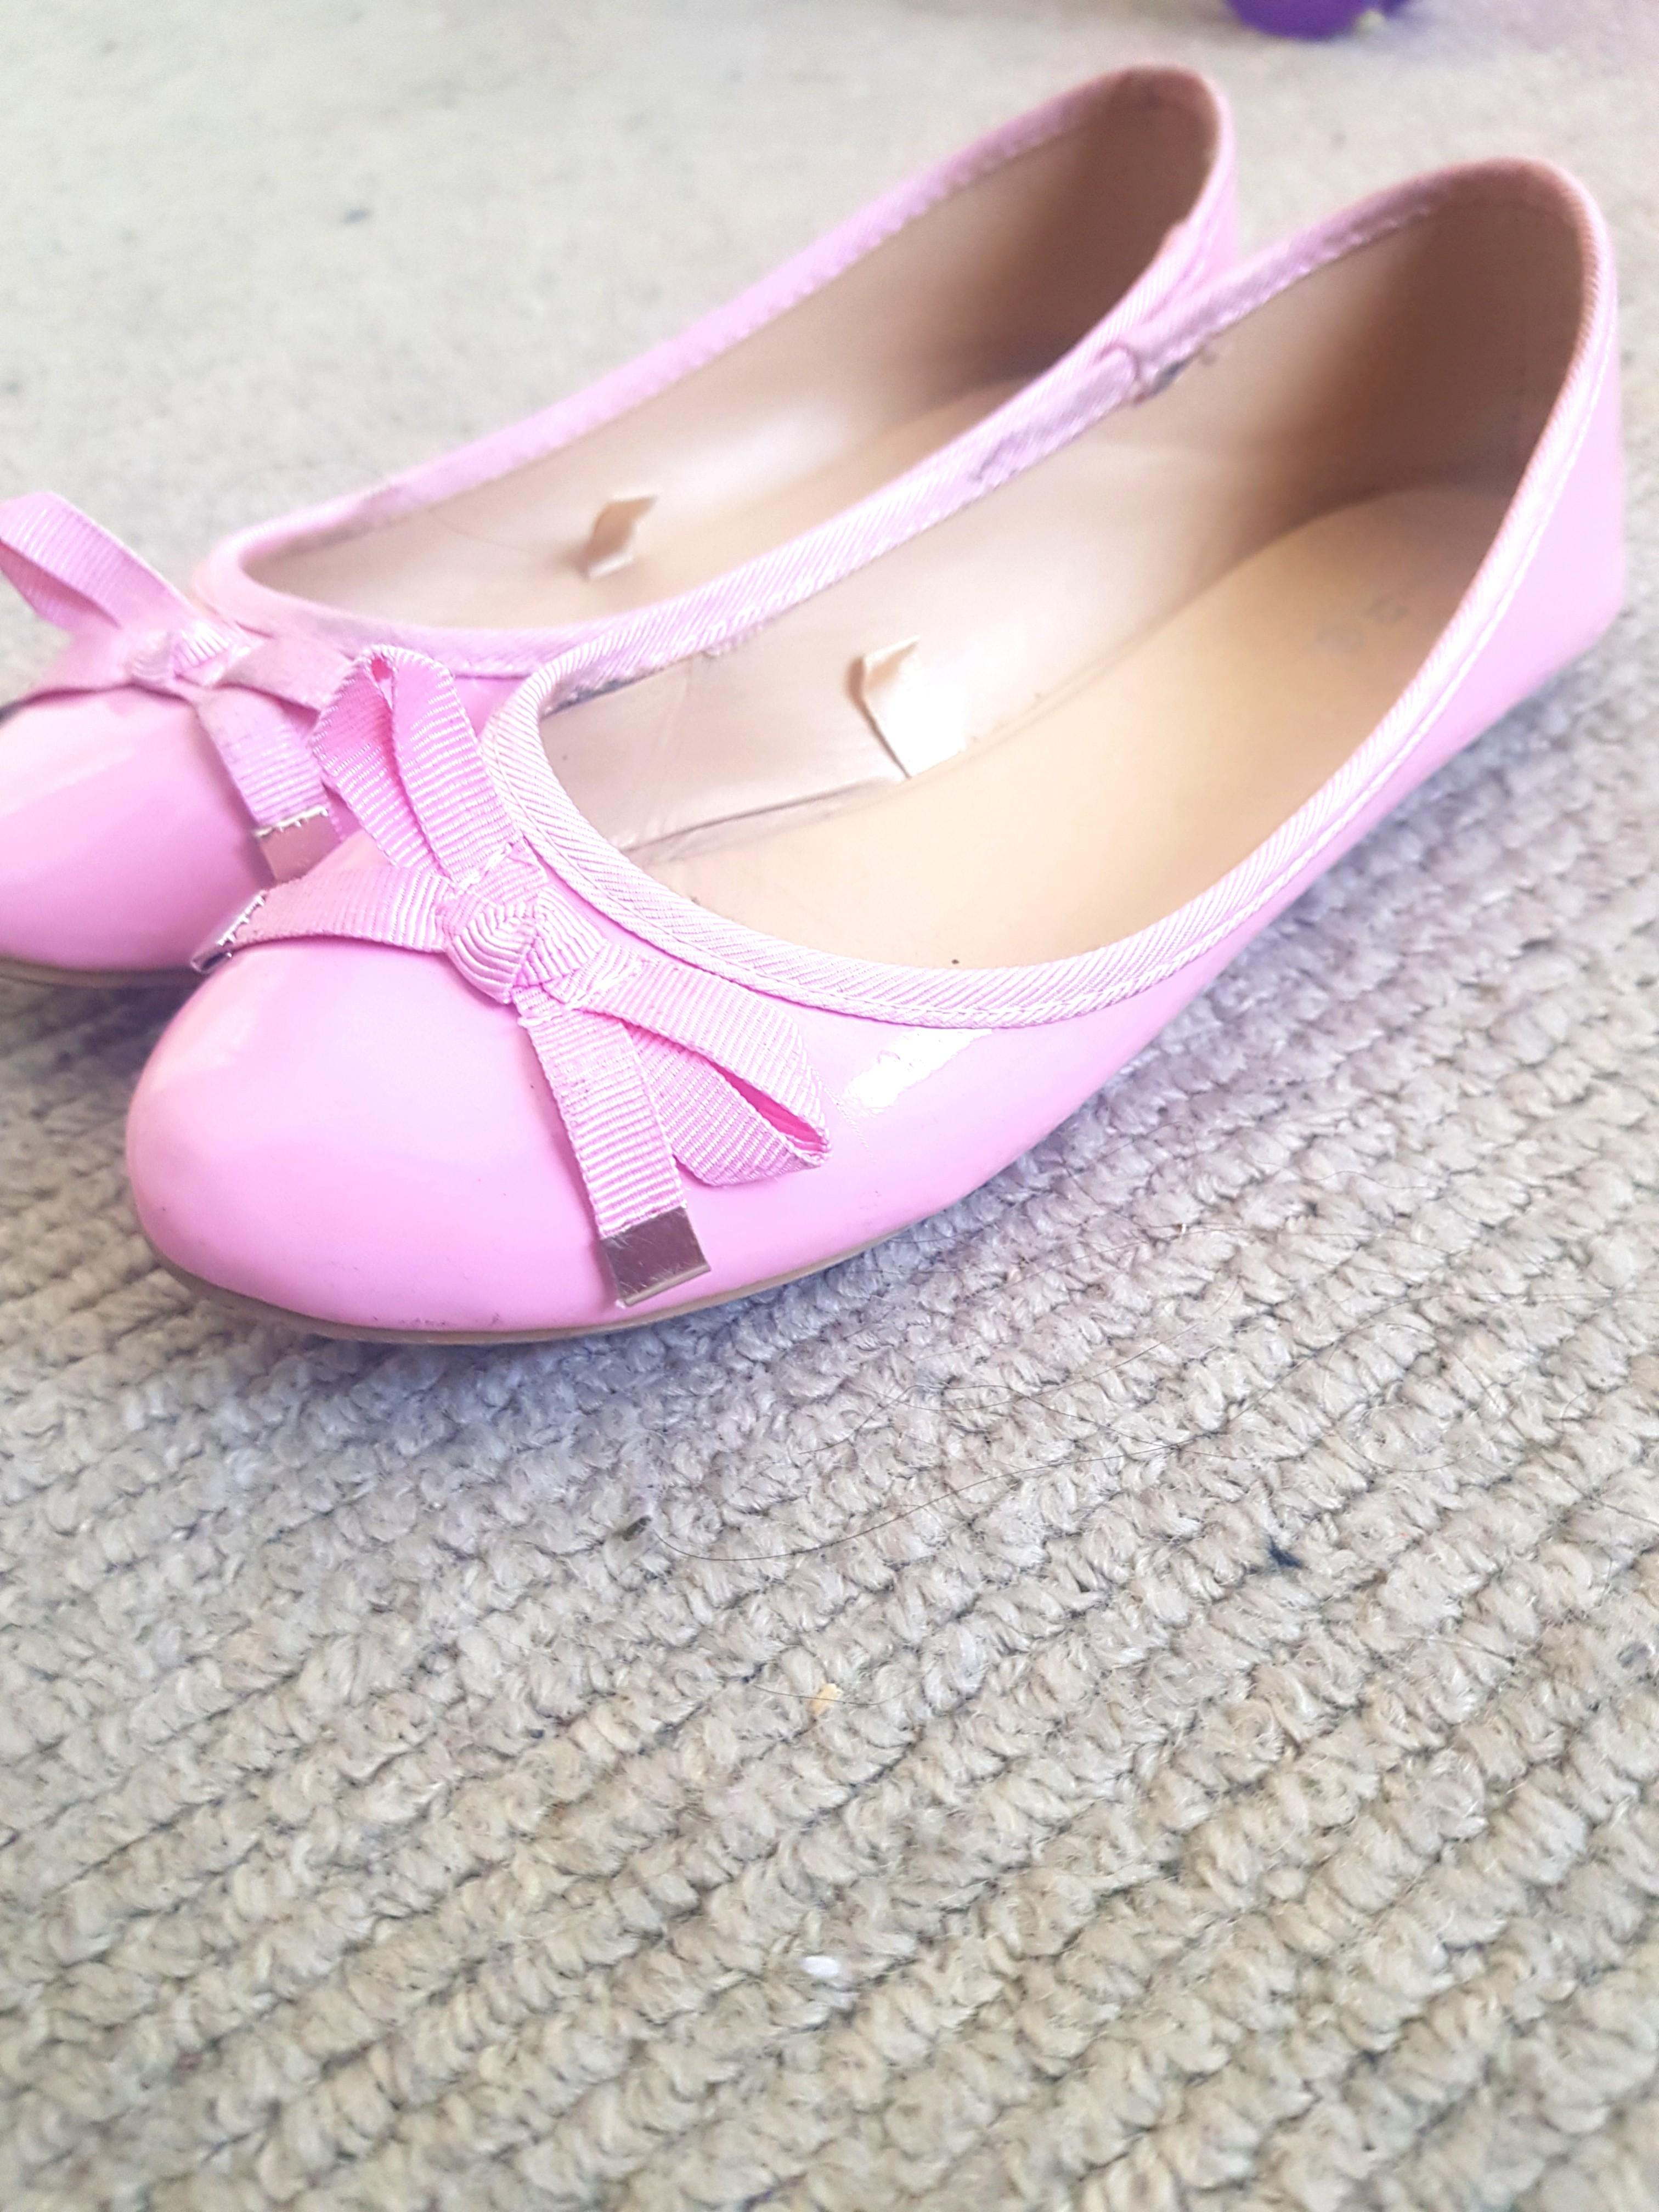 Size 13 light pink patent ballerina flat girls shoes